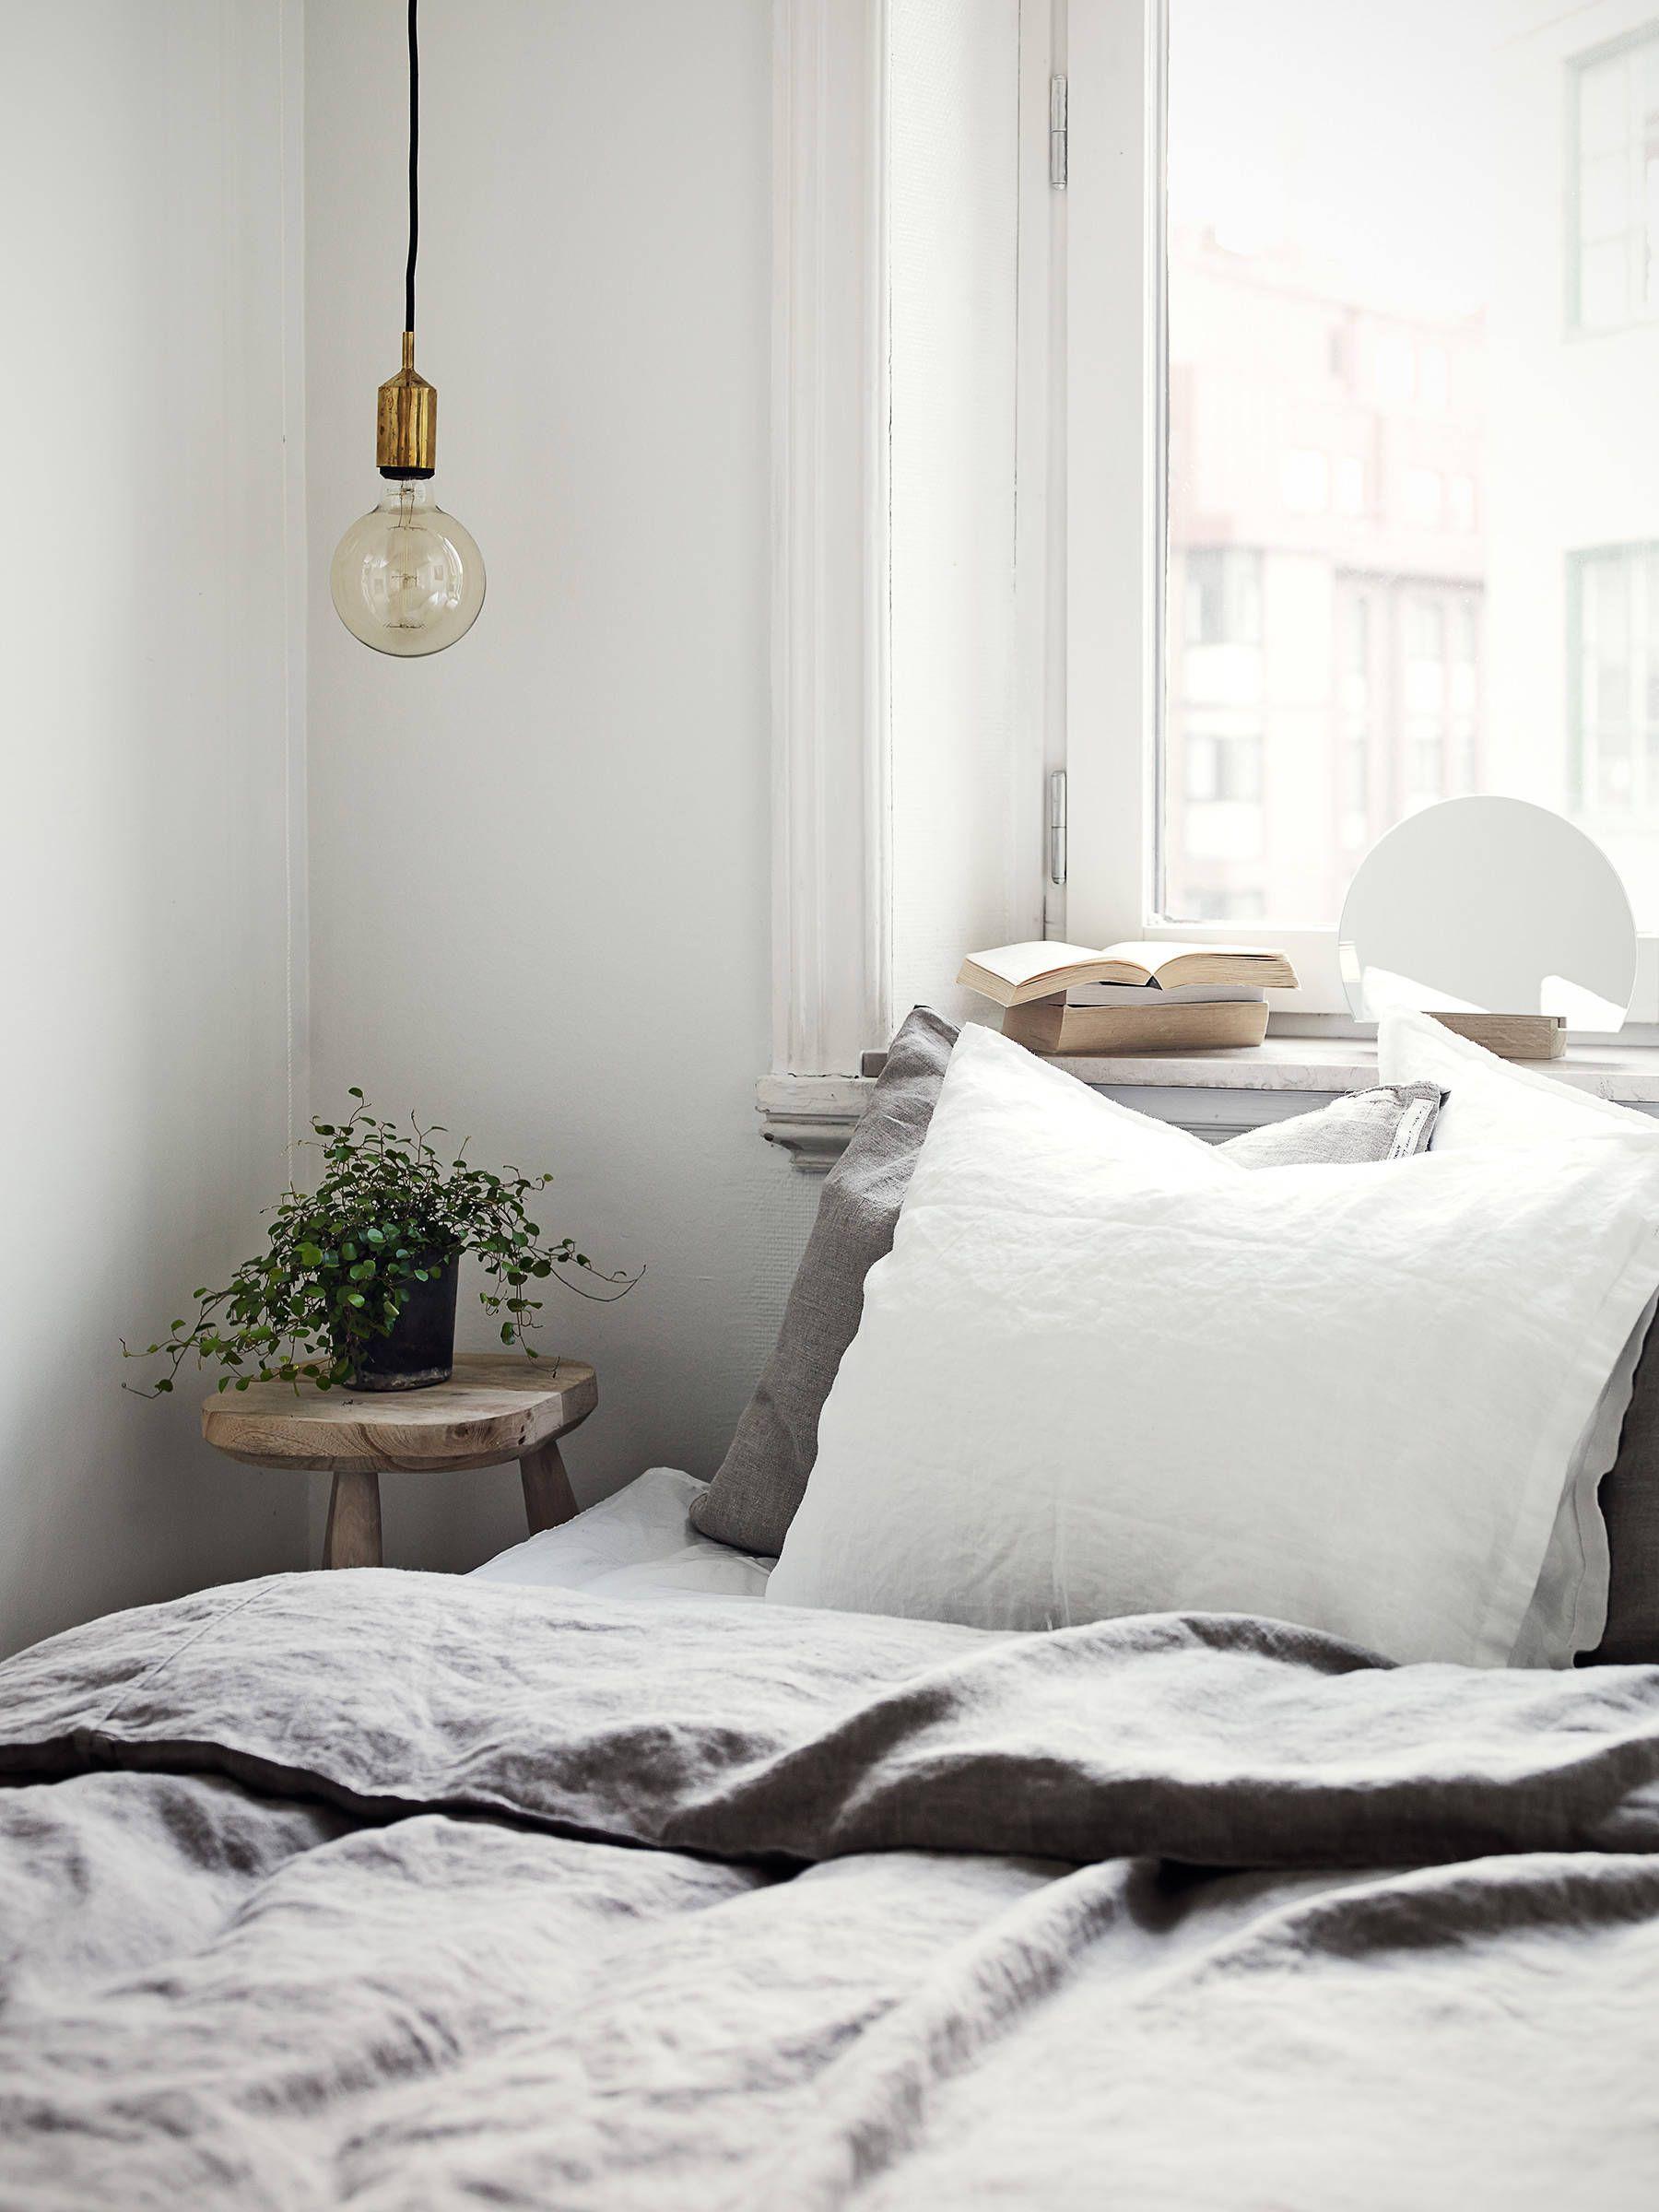 hangende lampen natuurslaapkamer scandinavische slaapkamer slaapkamer slaapkamerdecoratie inrichting kamer garderobe